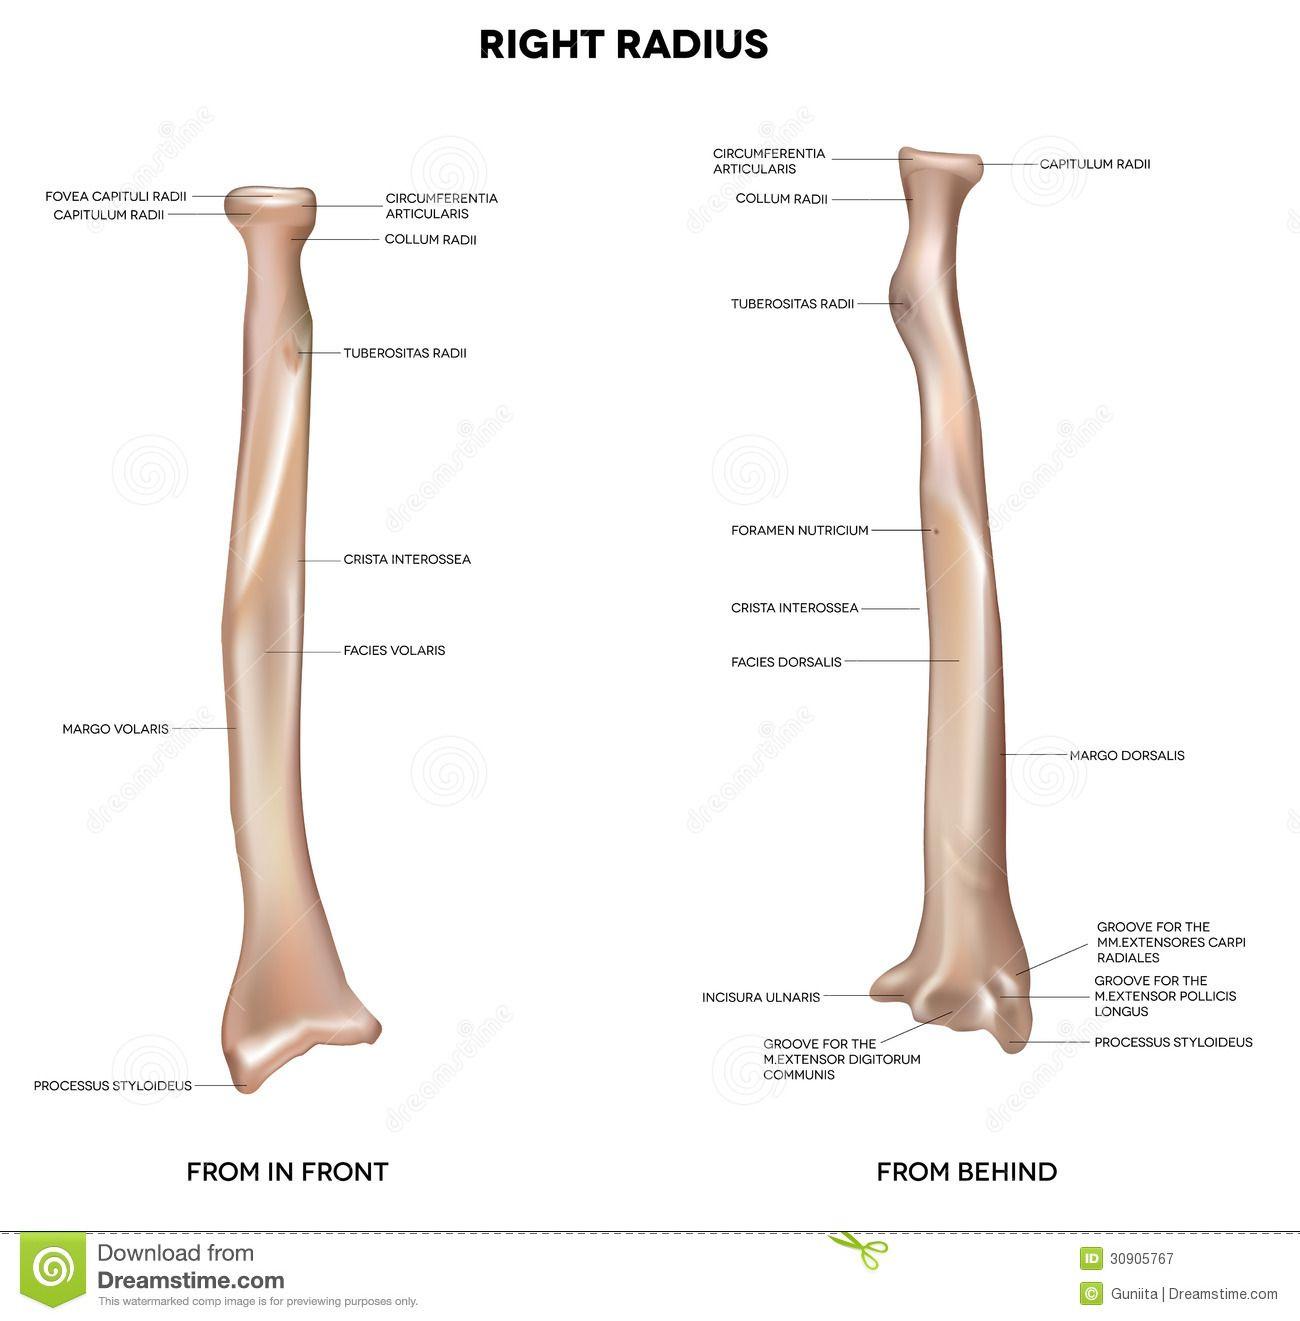 Radius Bone Markings Google Search Bones Pinterest Radius